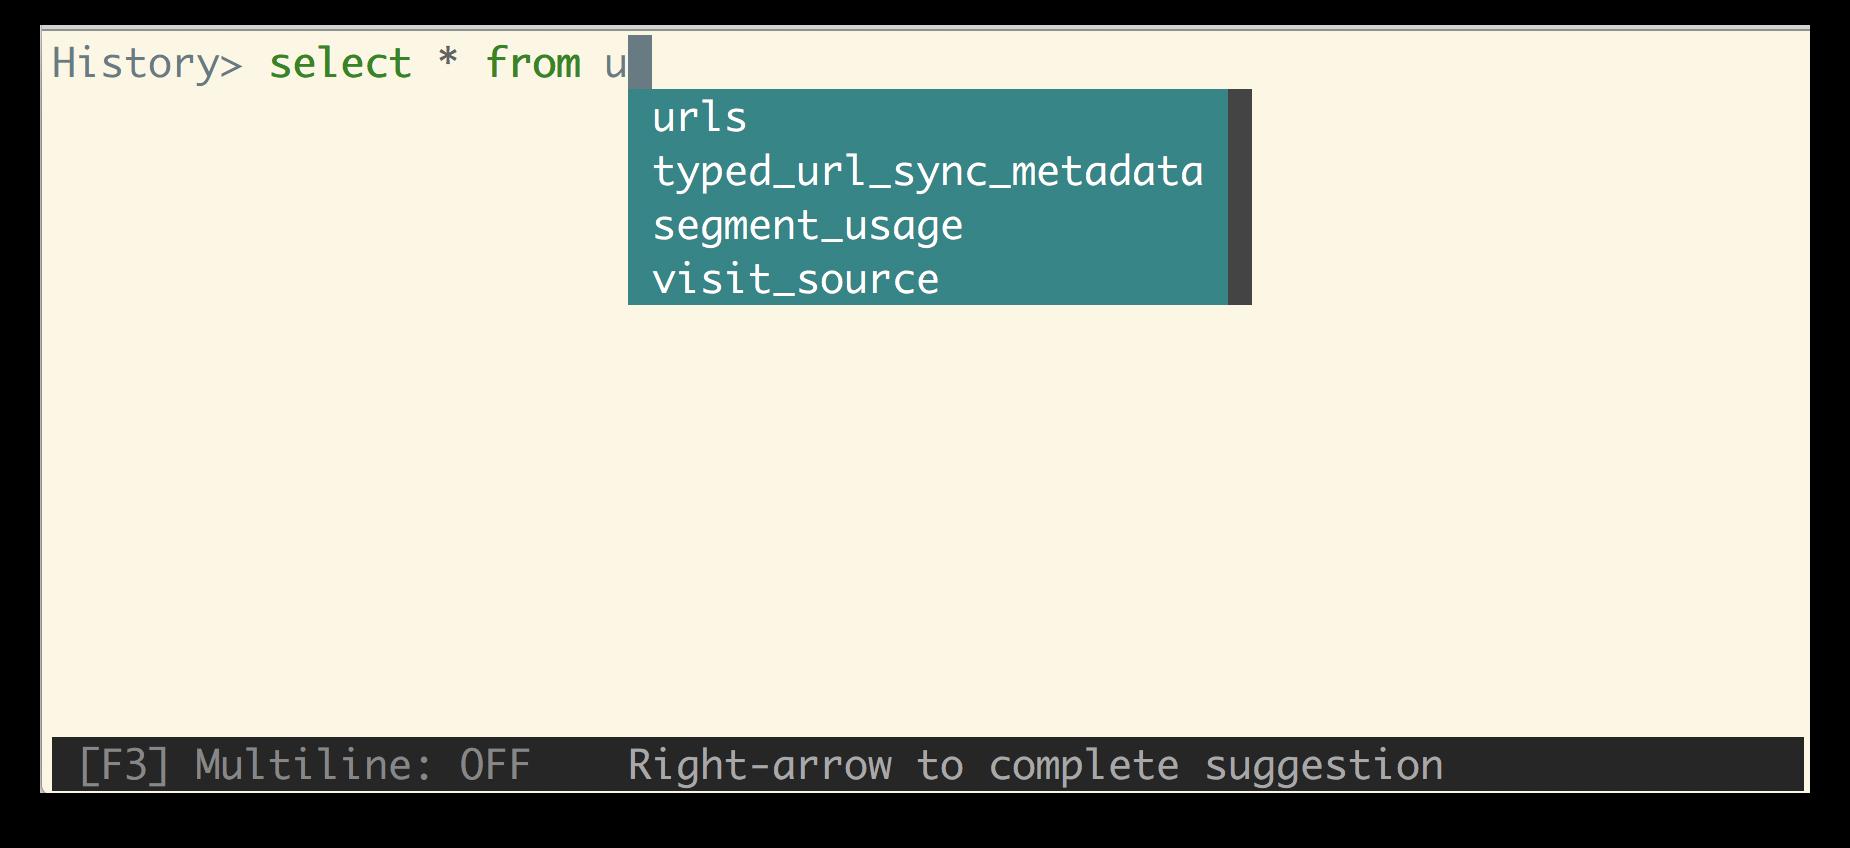 SQLite 数据库命令行工具 litecli